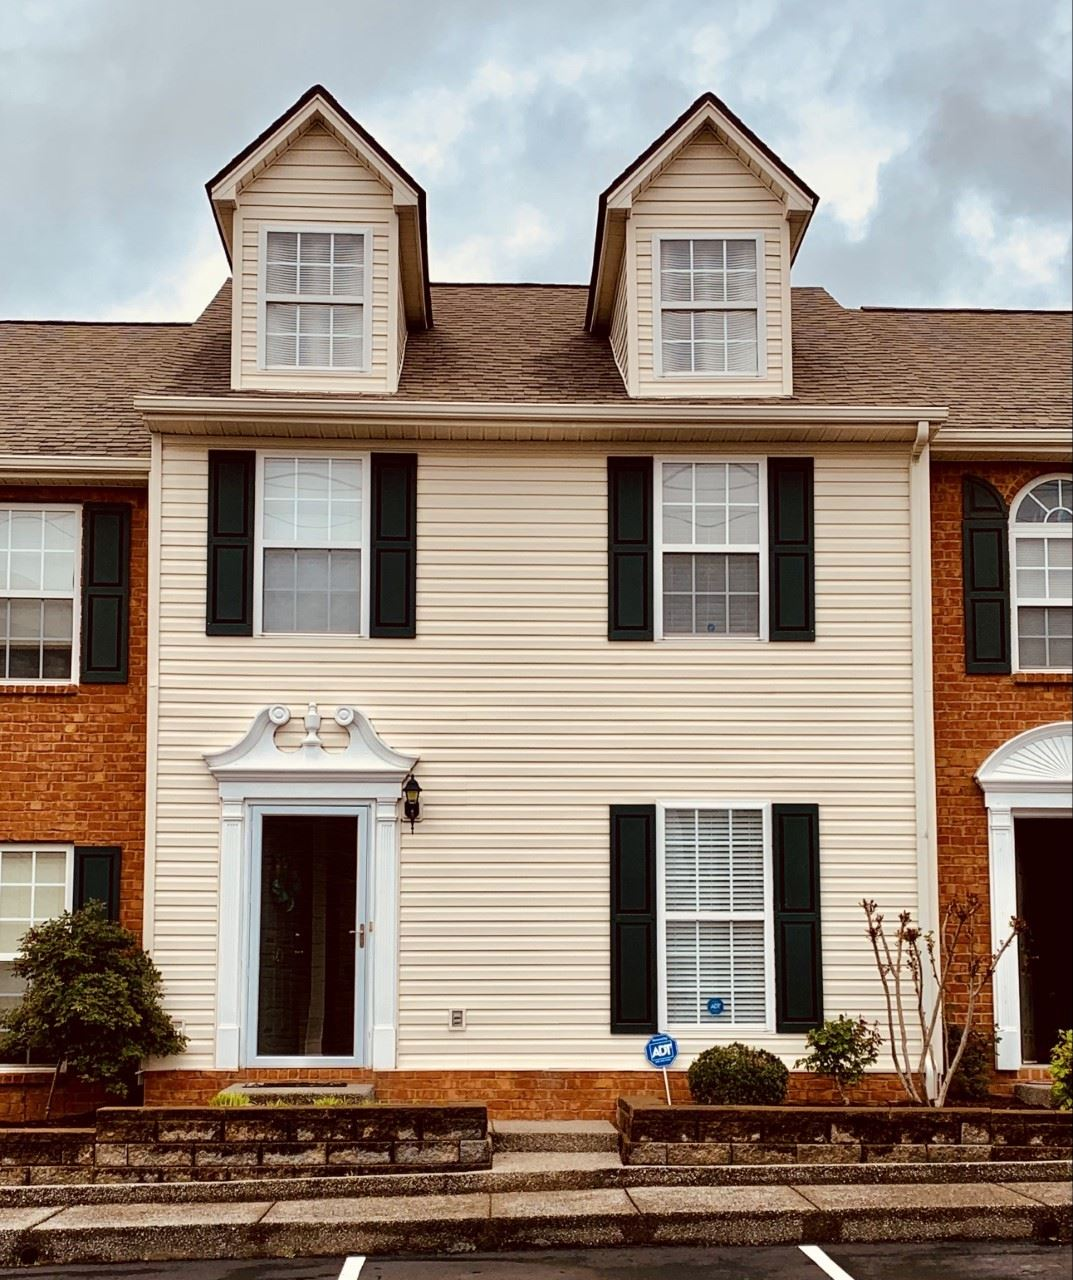 5170 Hickory Hollow Pkwy #147, Antioch, TN 37013 - MLS#: 2244822